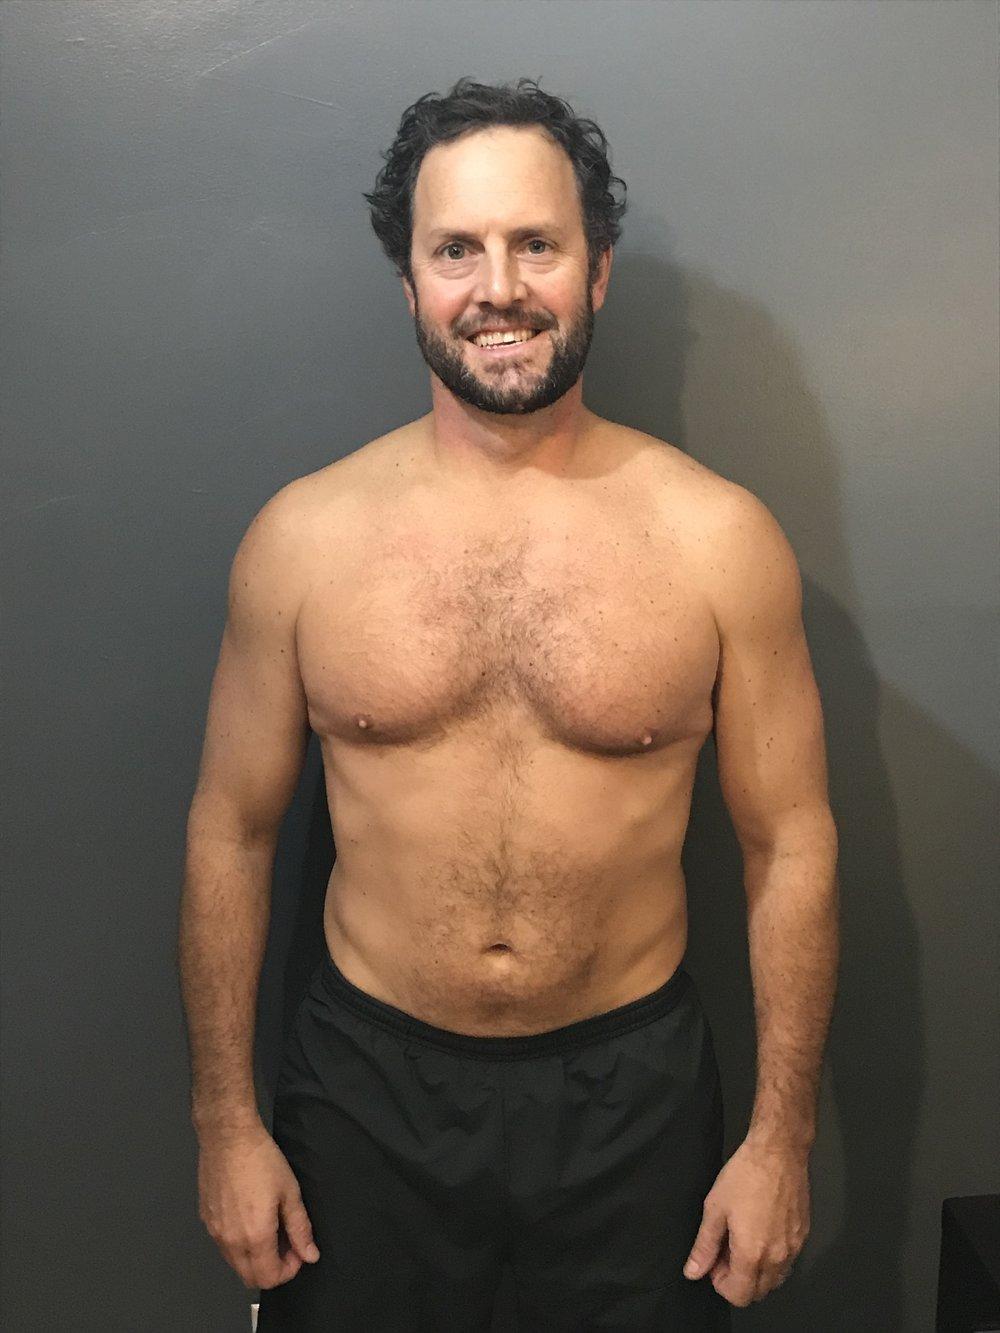 Day 21:176 lbs. - November 21, 2018